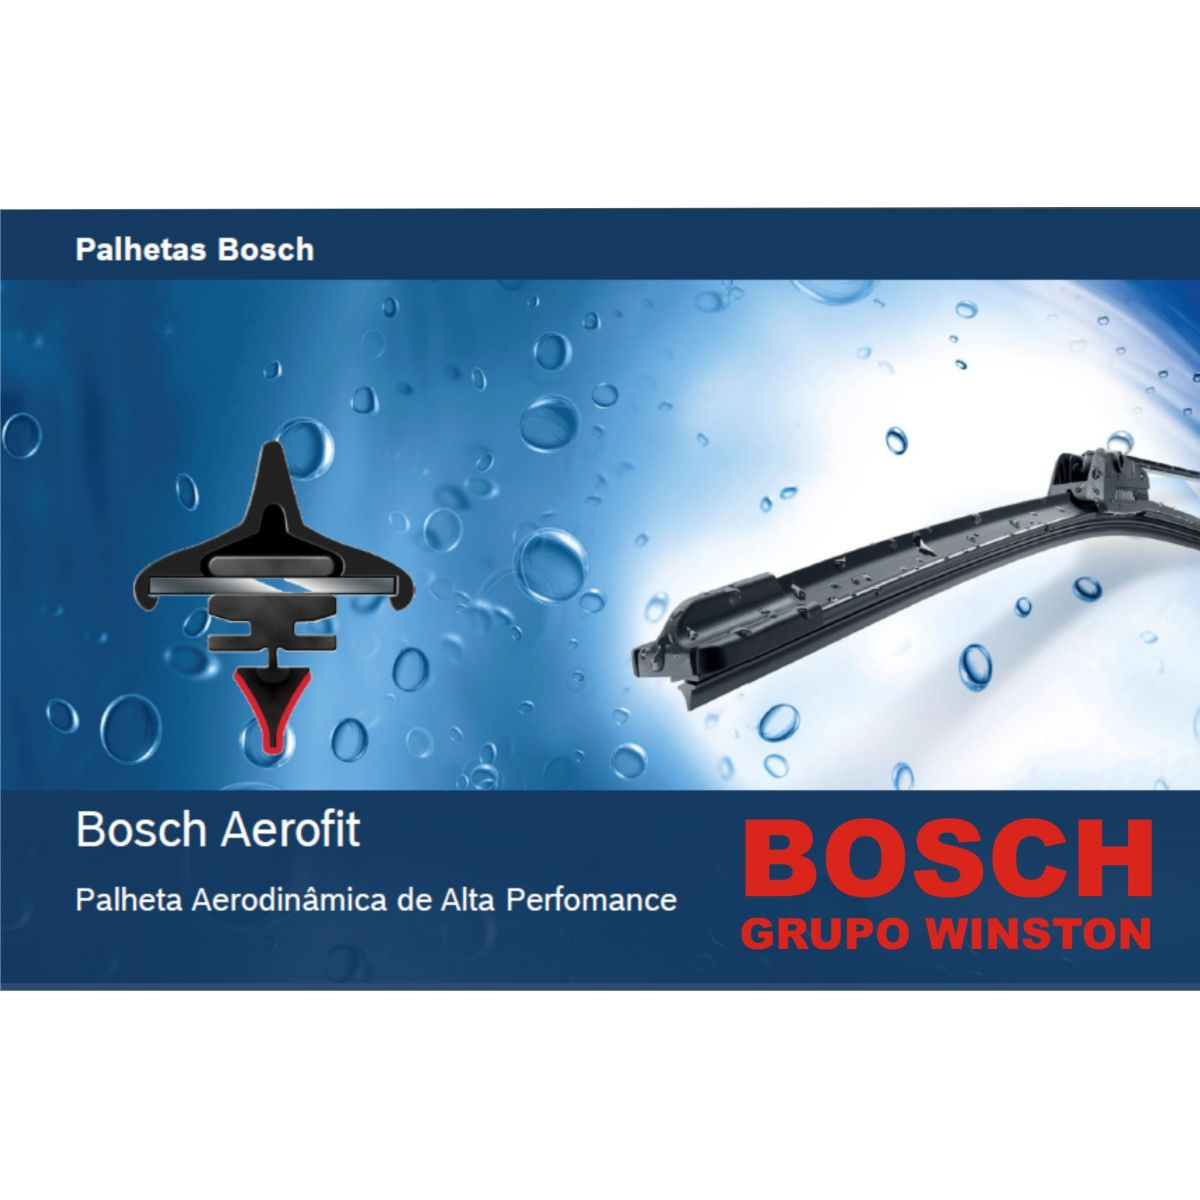 Palheta Bosch Aerofit Limpador de para brisa Bosch TOYOTA Corolla / SW RAV4